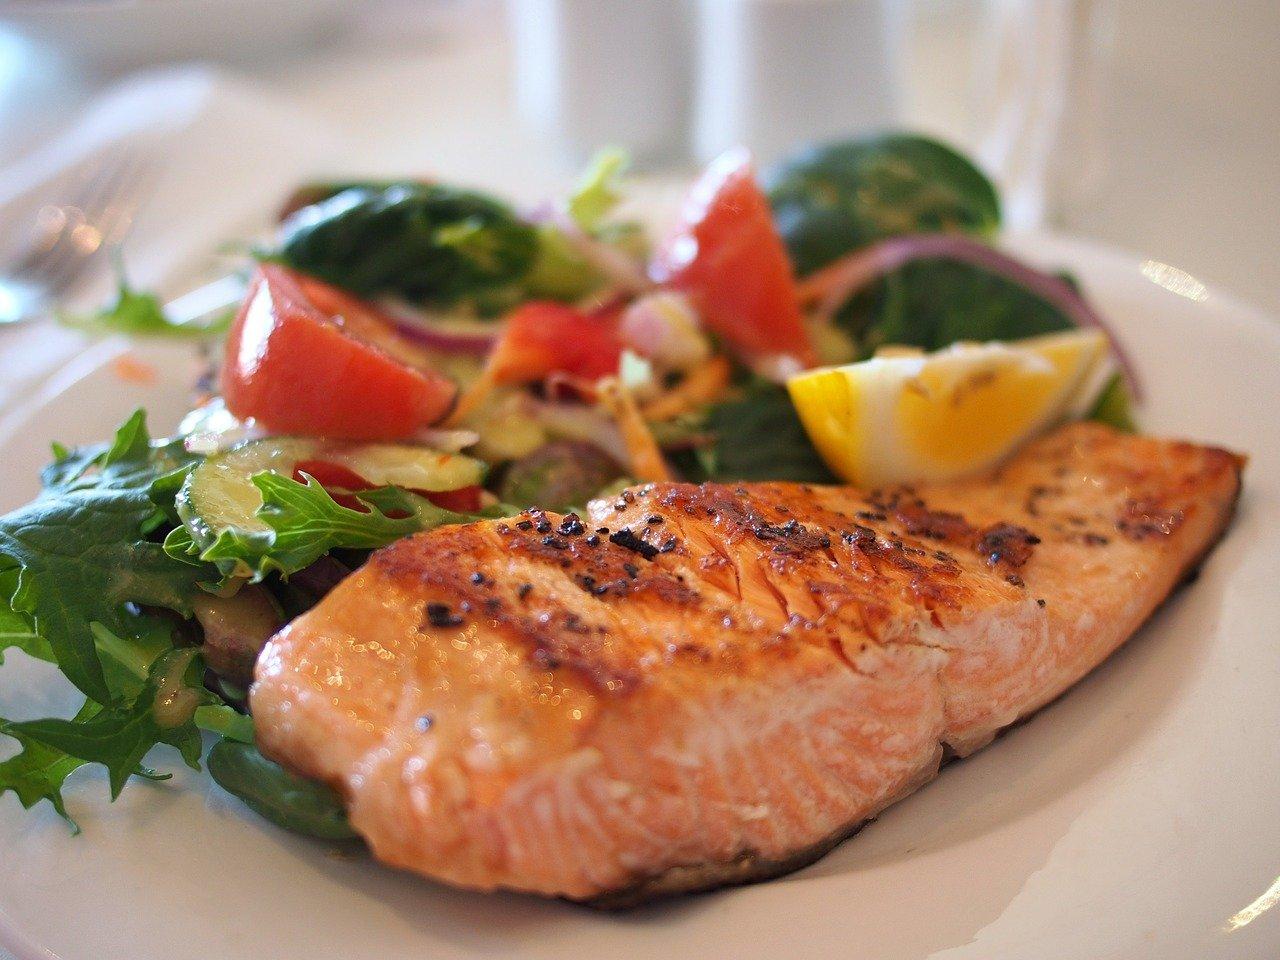 Losos - zdroj omega 3